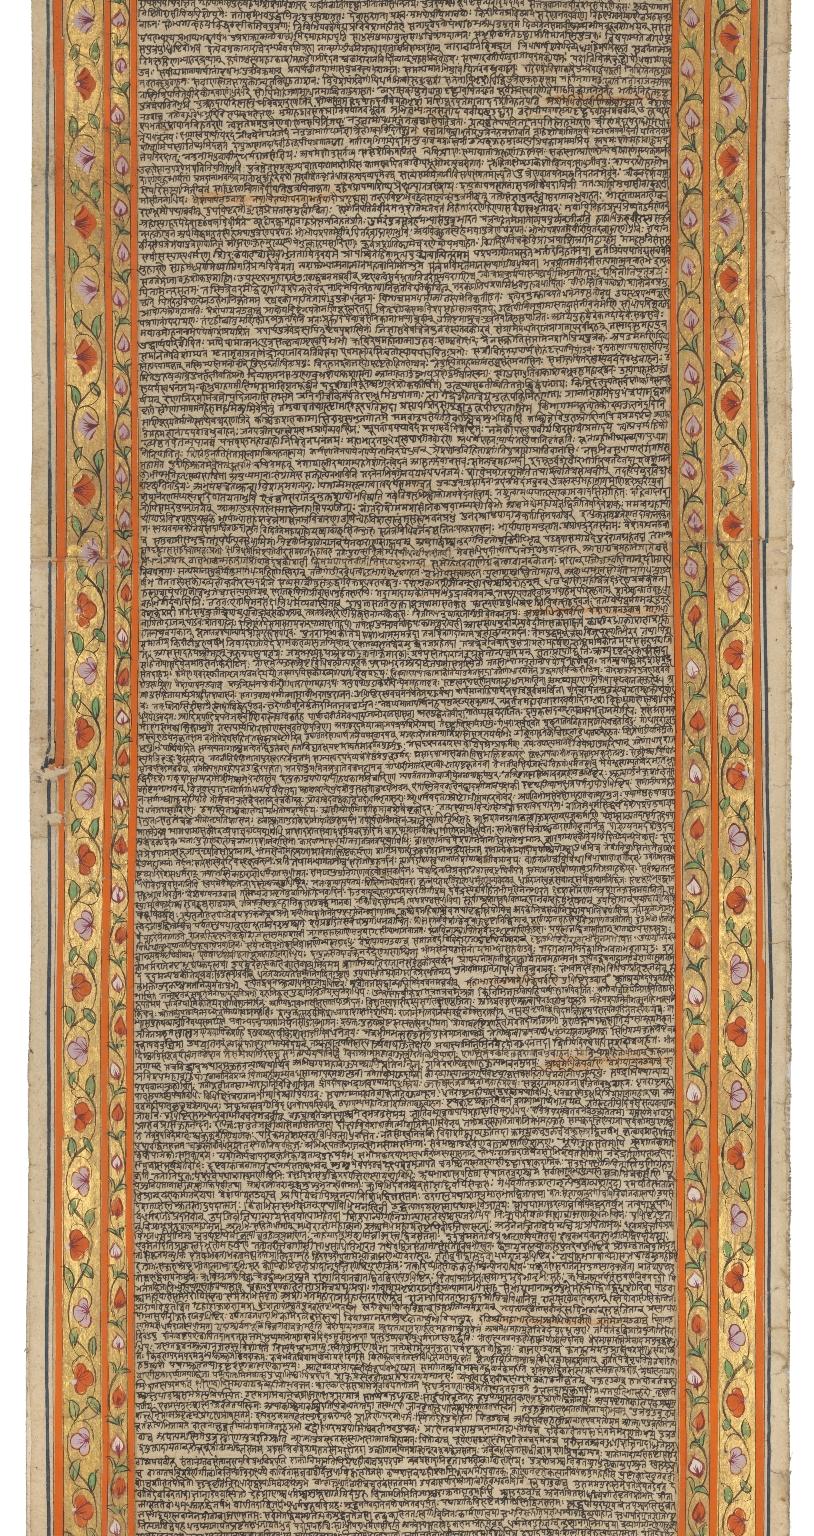 Mahabharata scroll